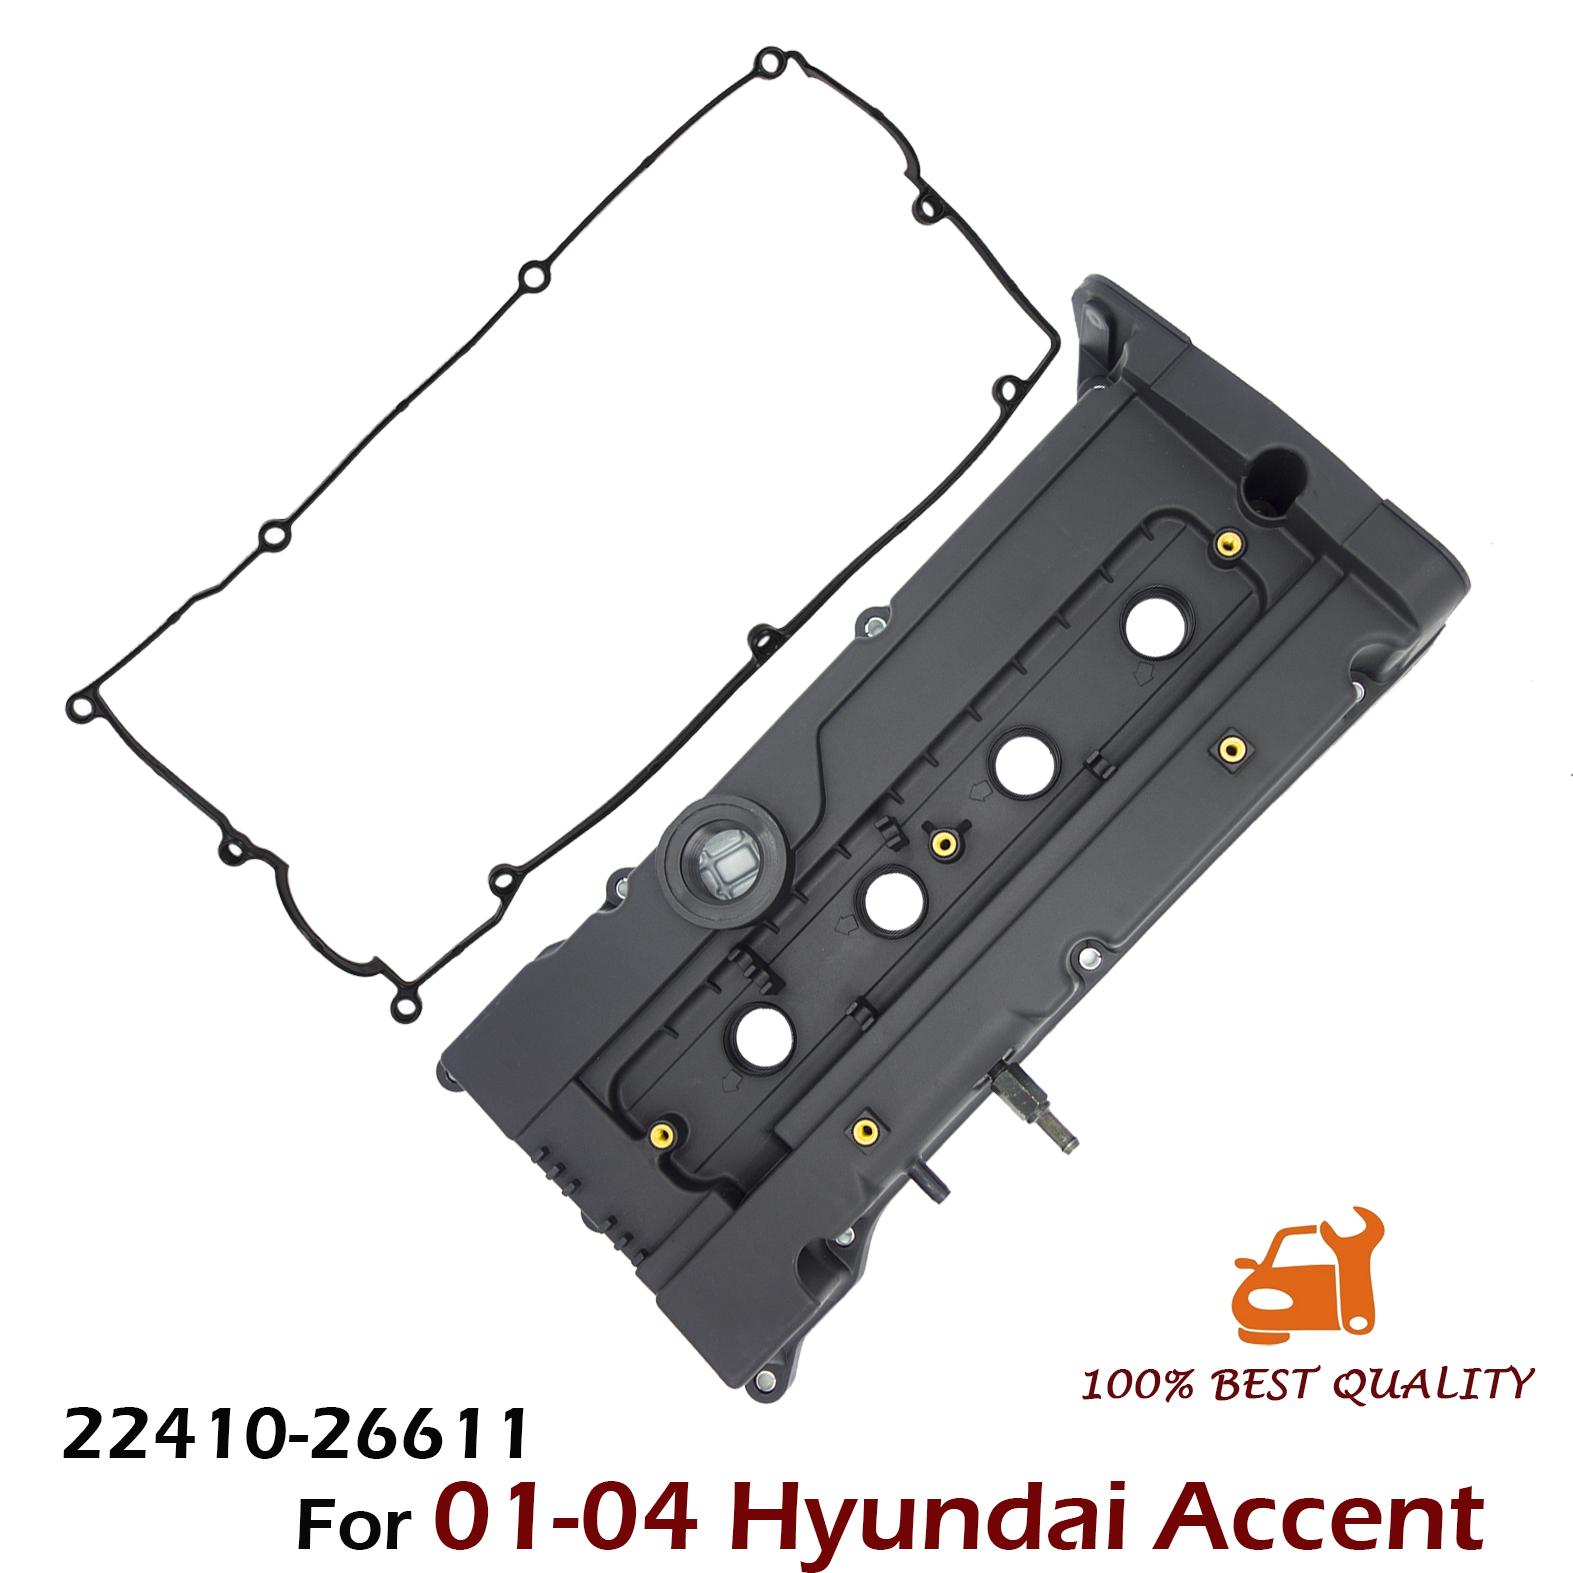 Engine Valve Cover PCV Valve Gasket for 01-04 Hyundai Accent OEM 2241026611